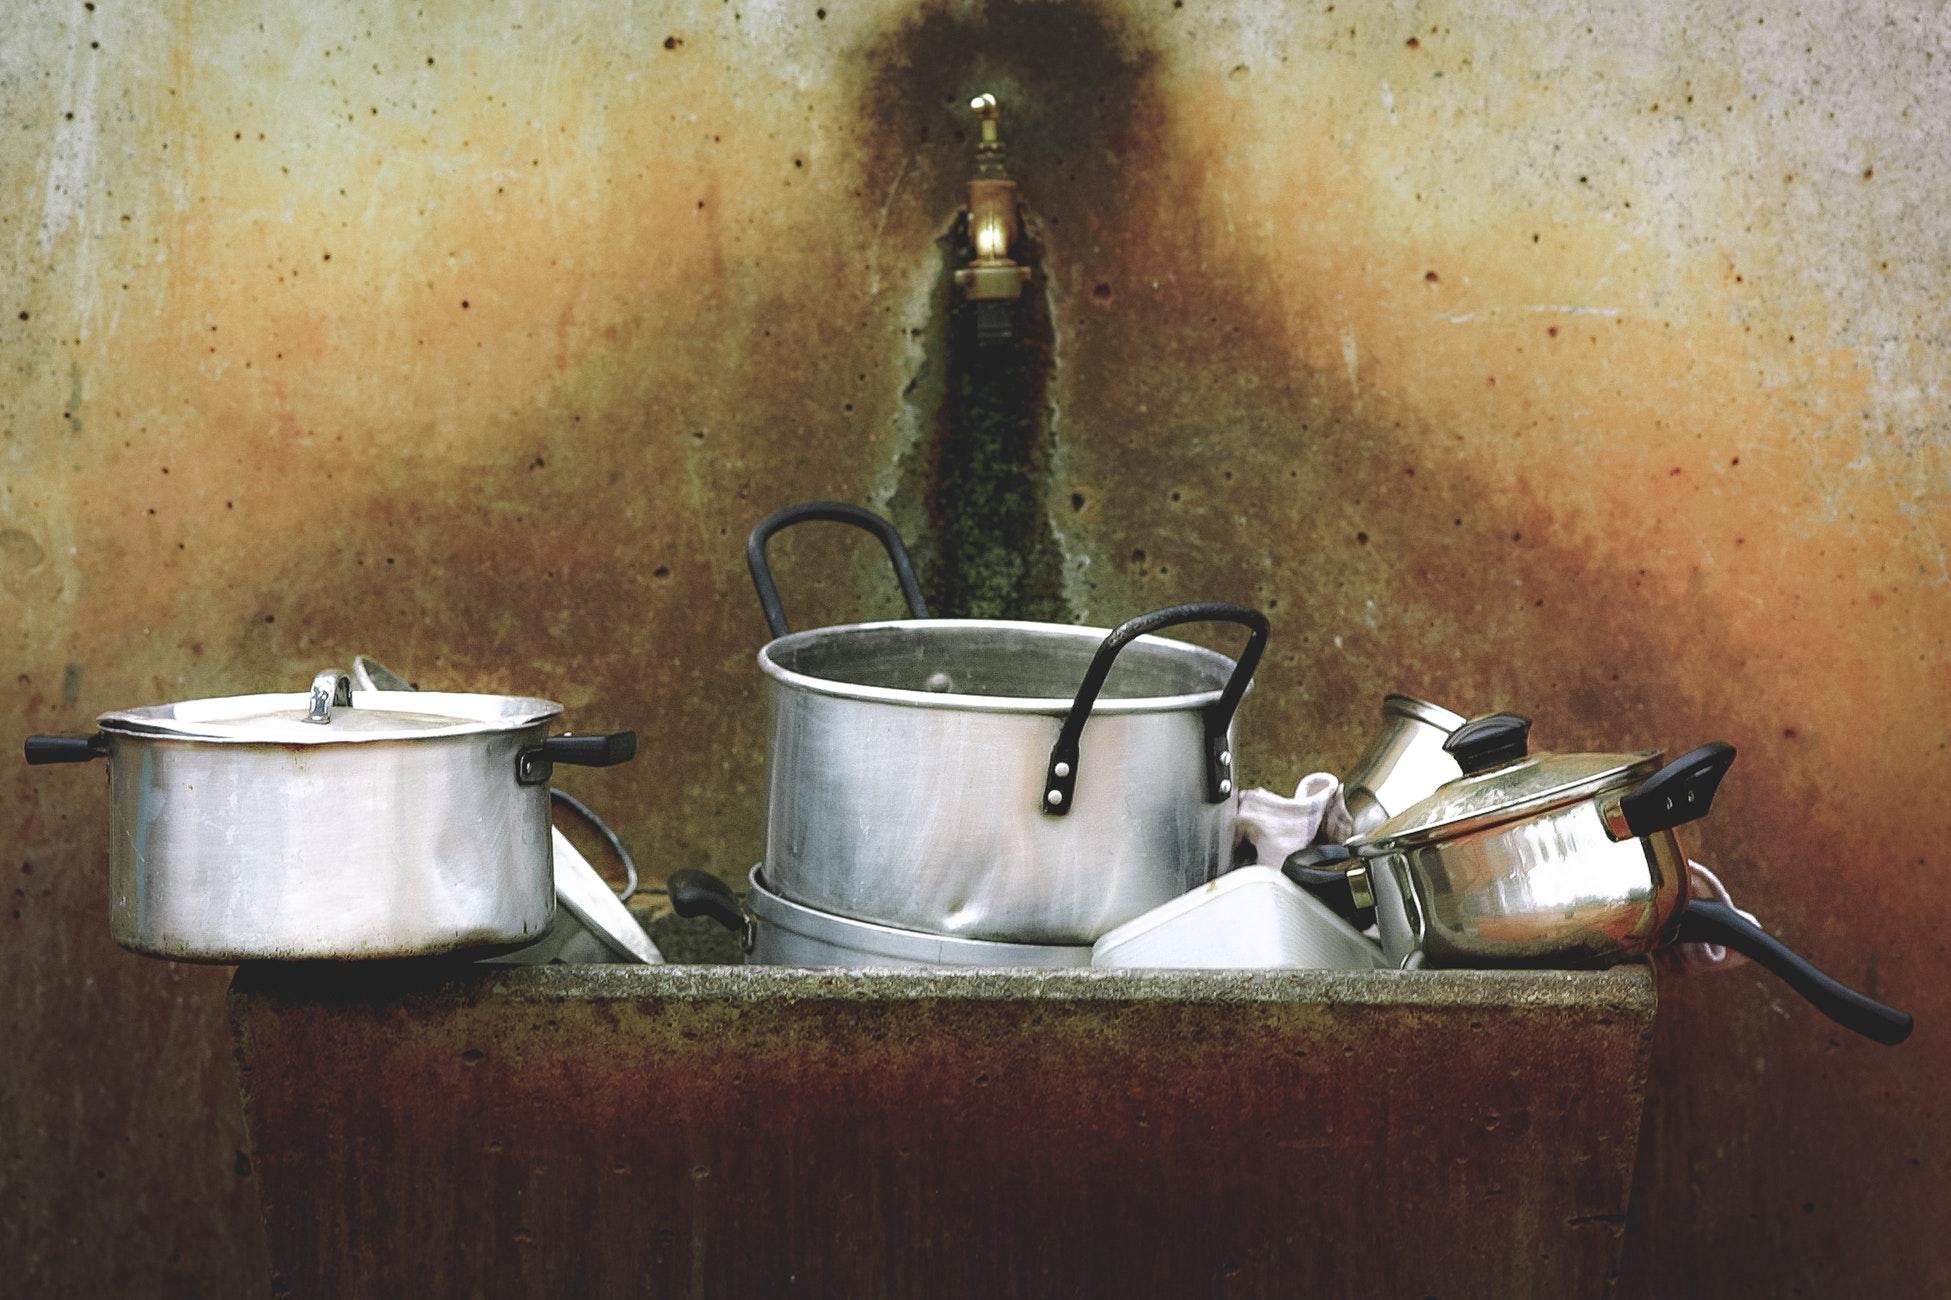 Tap2Drain Plumbing - Plumber Mission, Abbotsford, Langley, Chilliwack, Pots Rustic Image